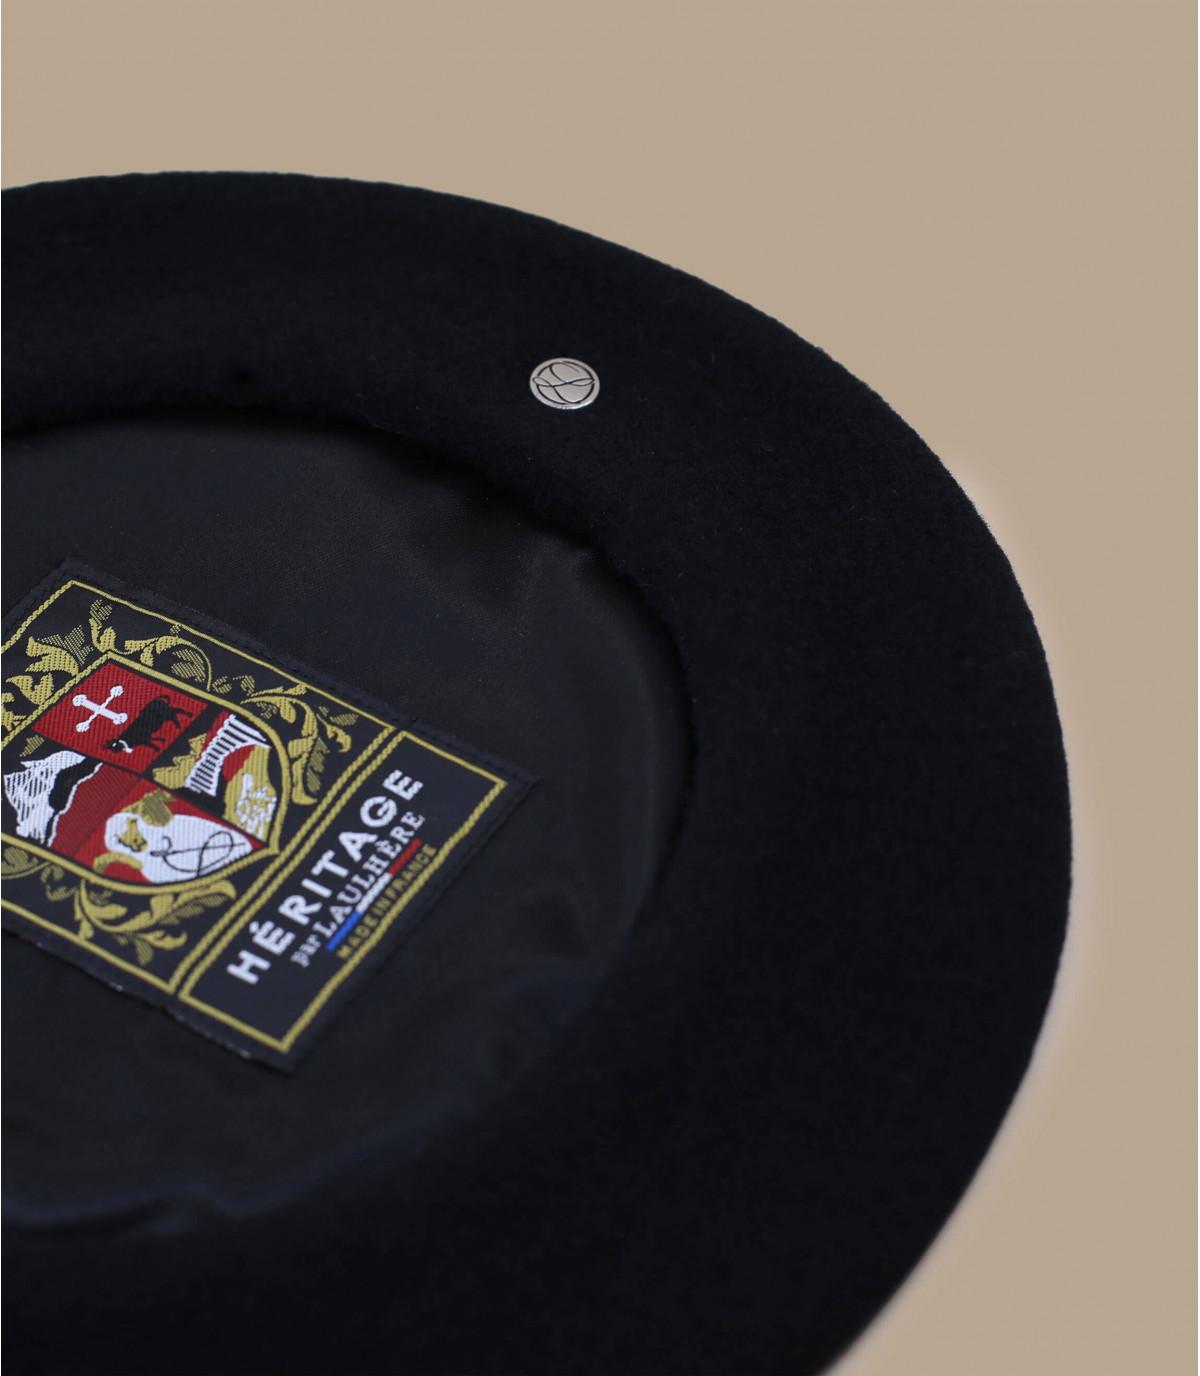 Dettagli Brigitte black - image 2